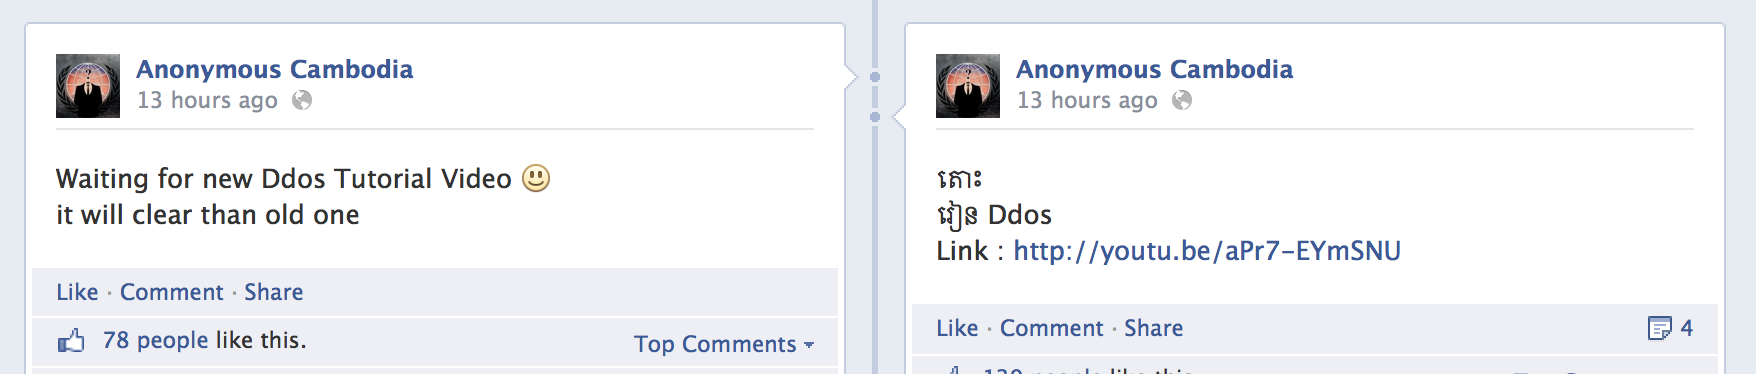 Screenshot 2014-04-24 10.46.27